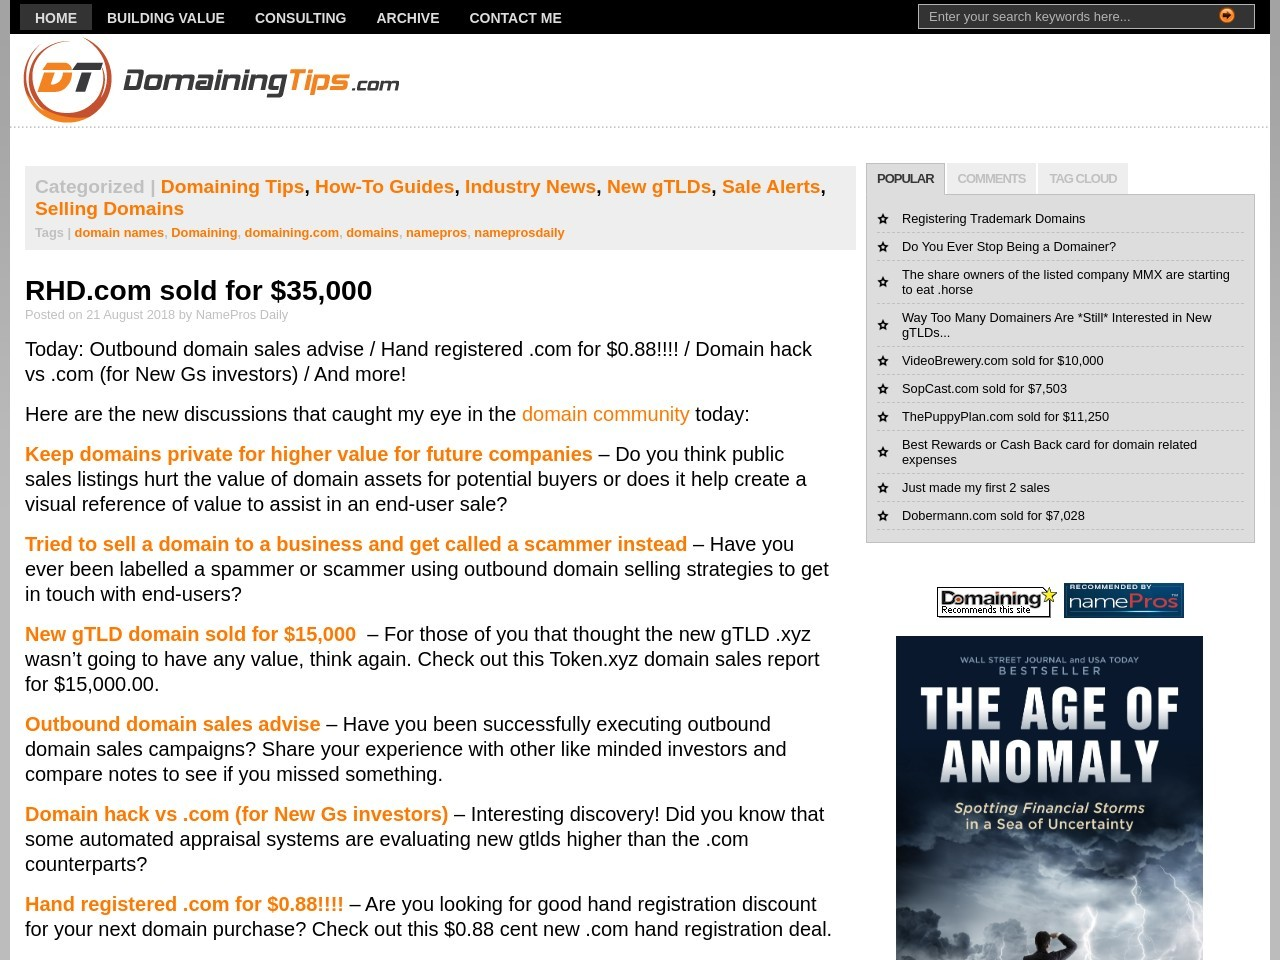 RHD.com sold for $35,000